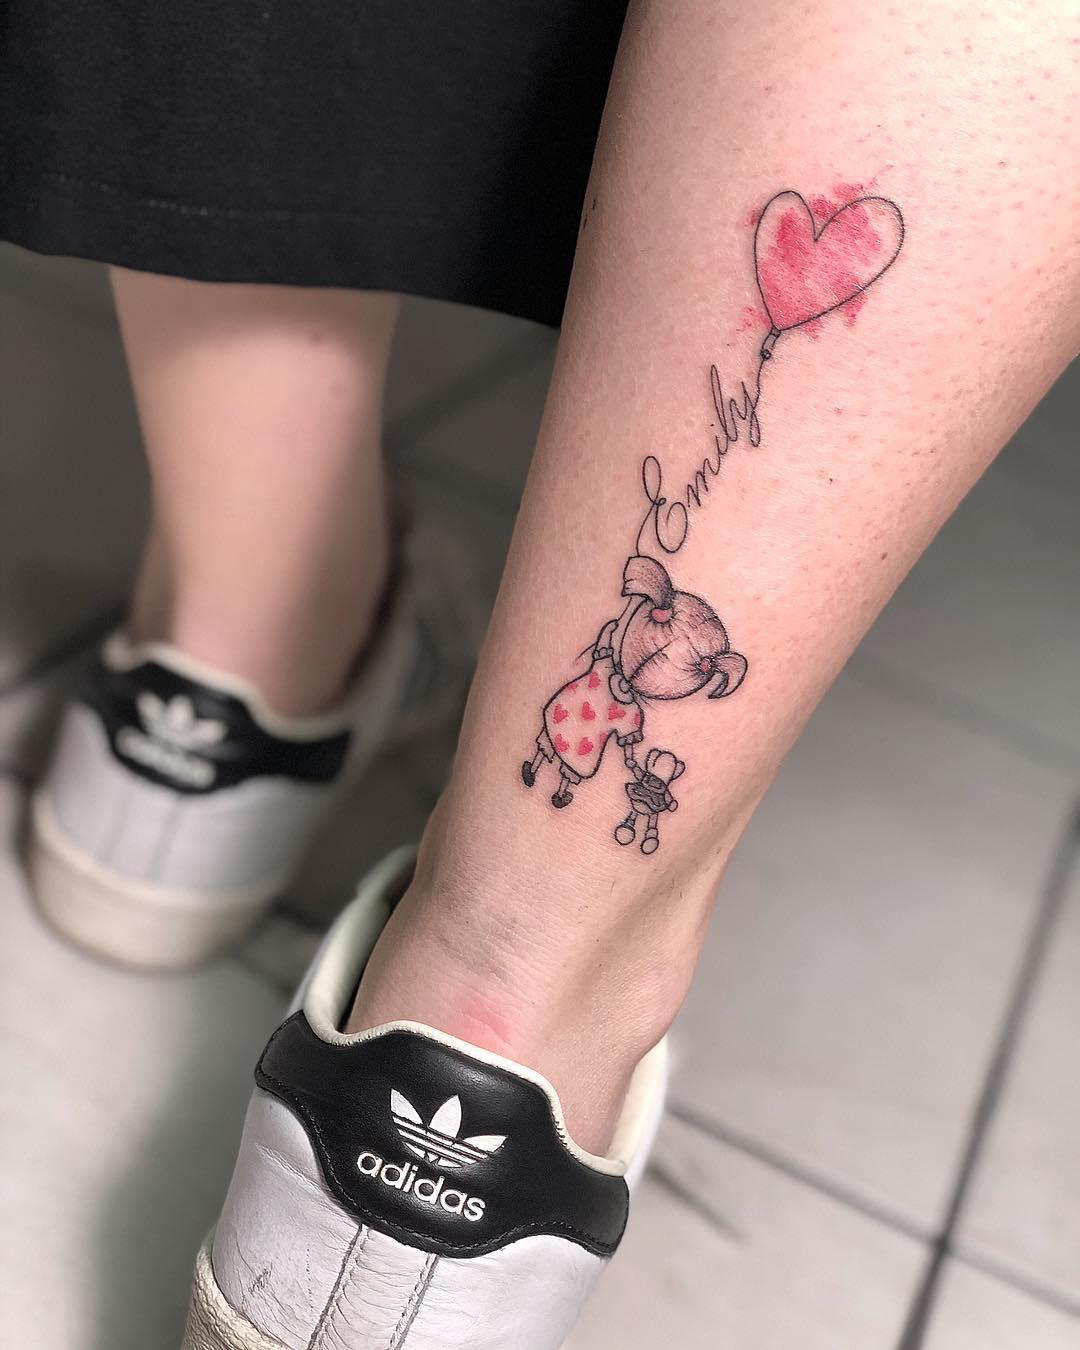 Татуировки в виде матери и ребёнка фото 26